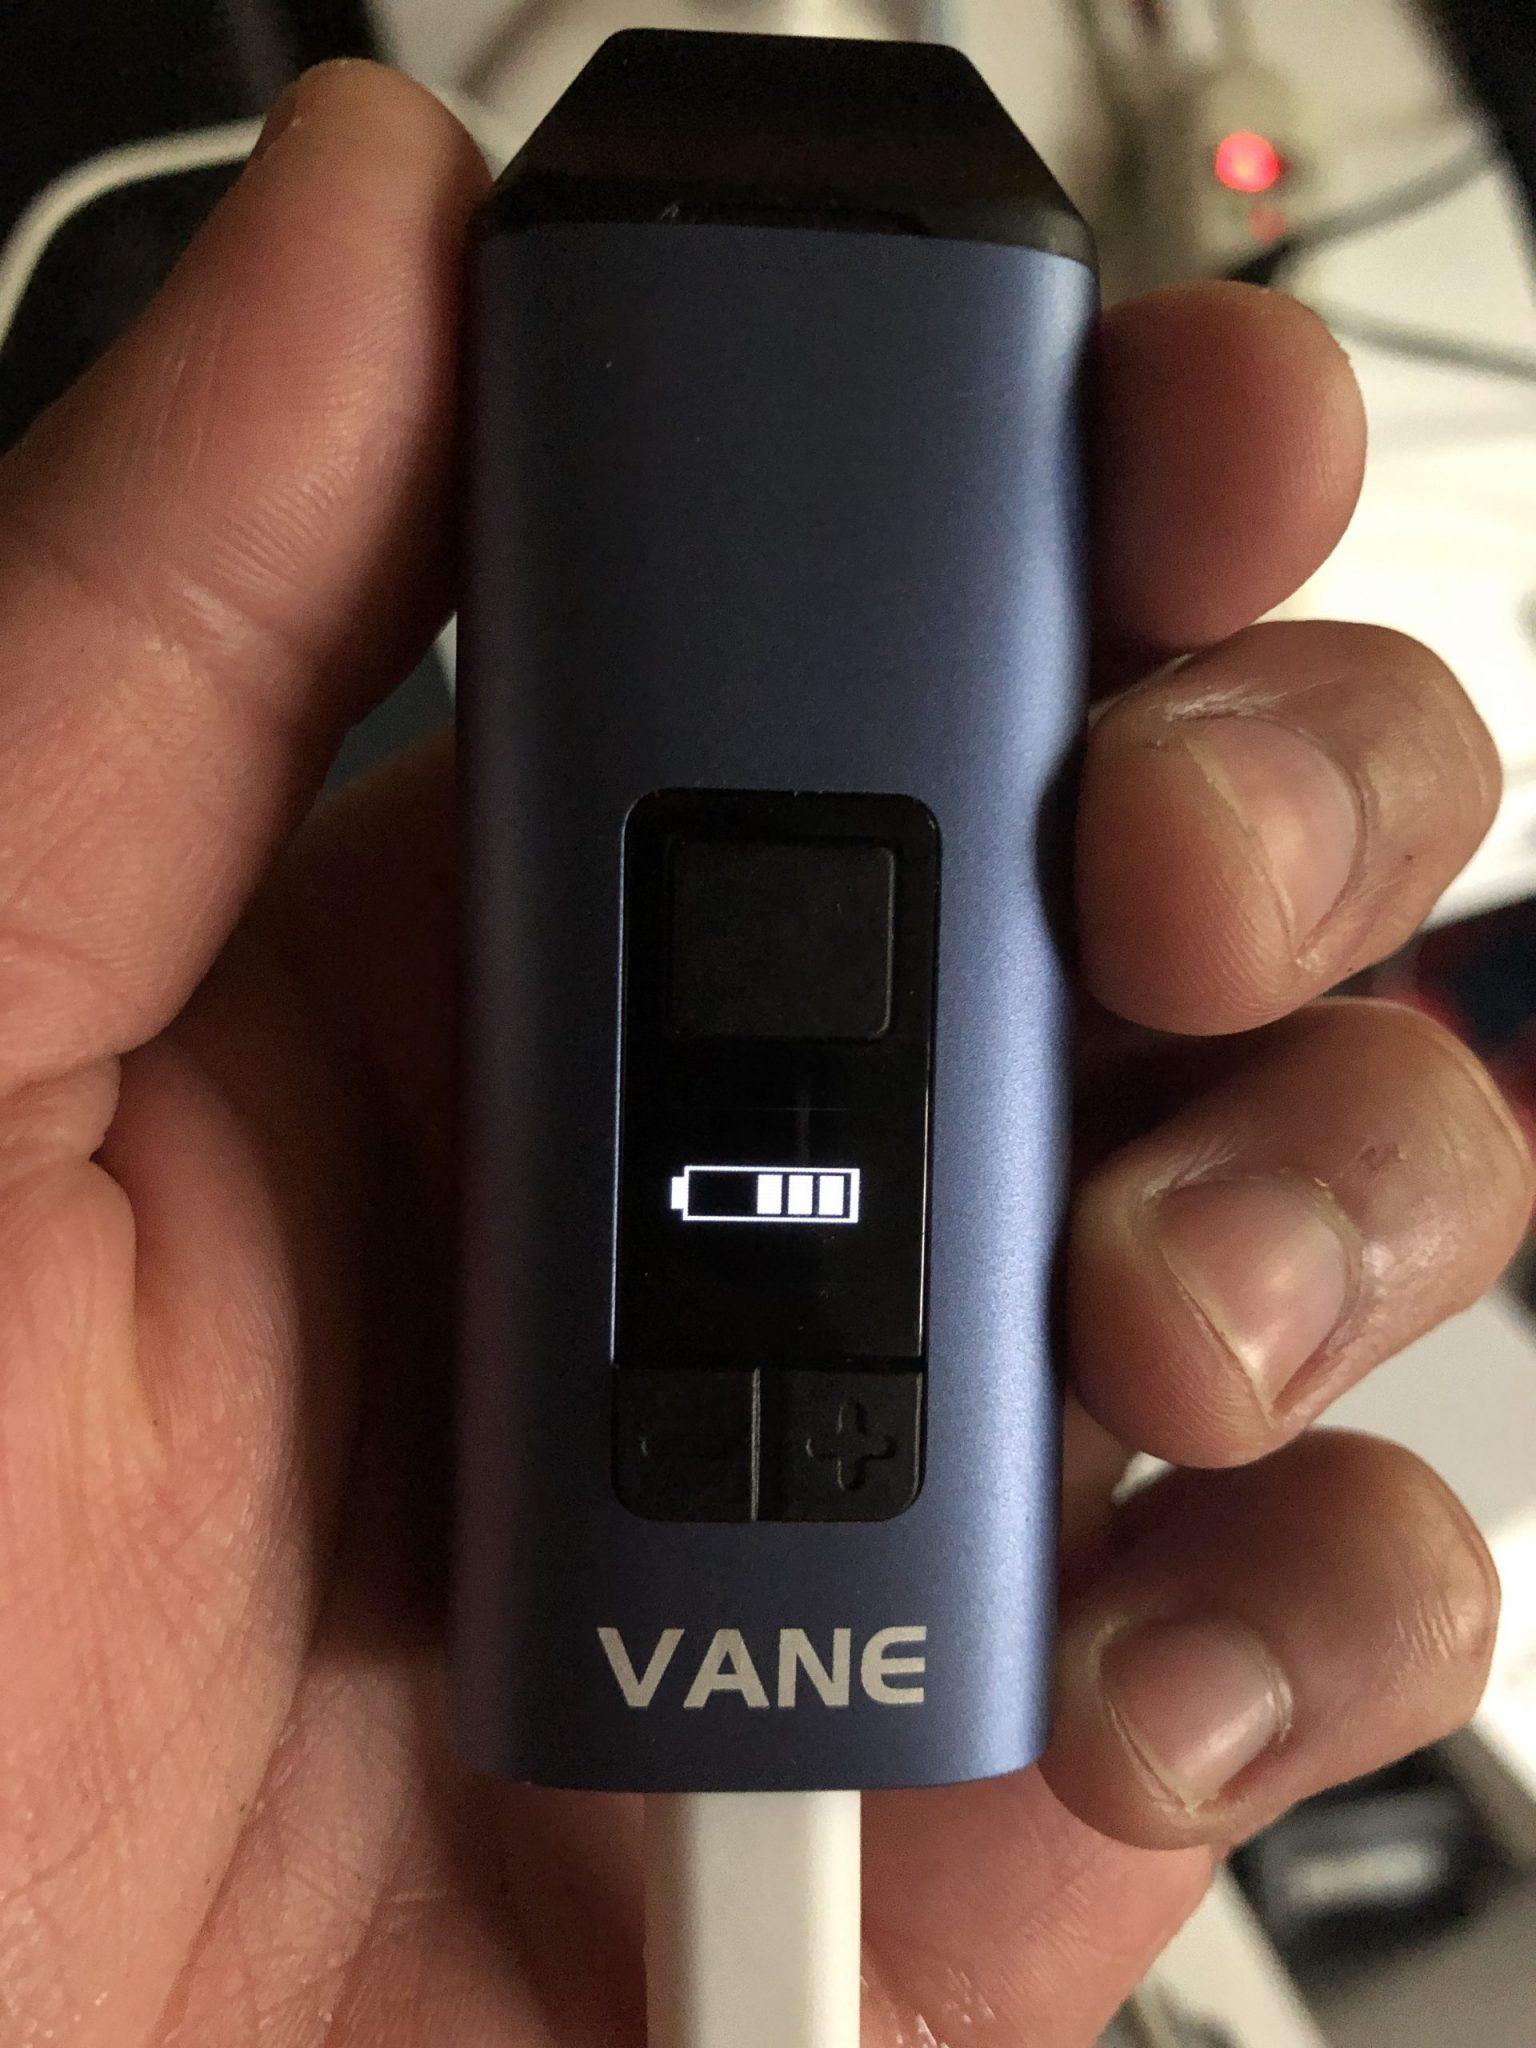 yocan vane battery